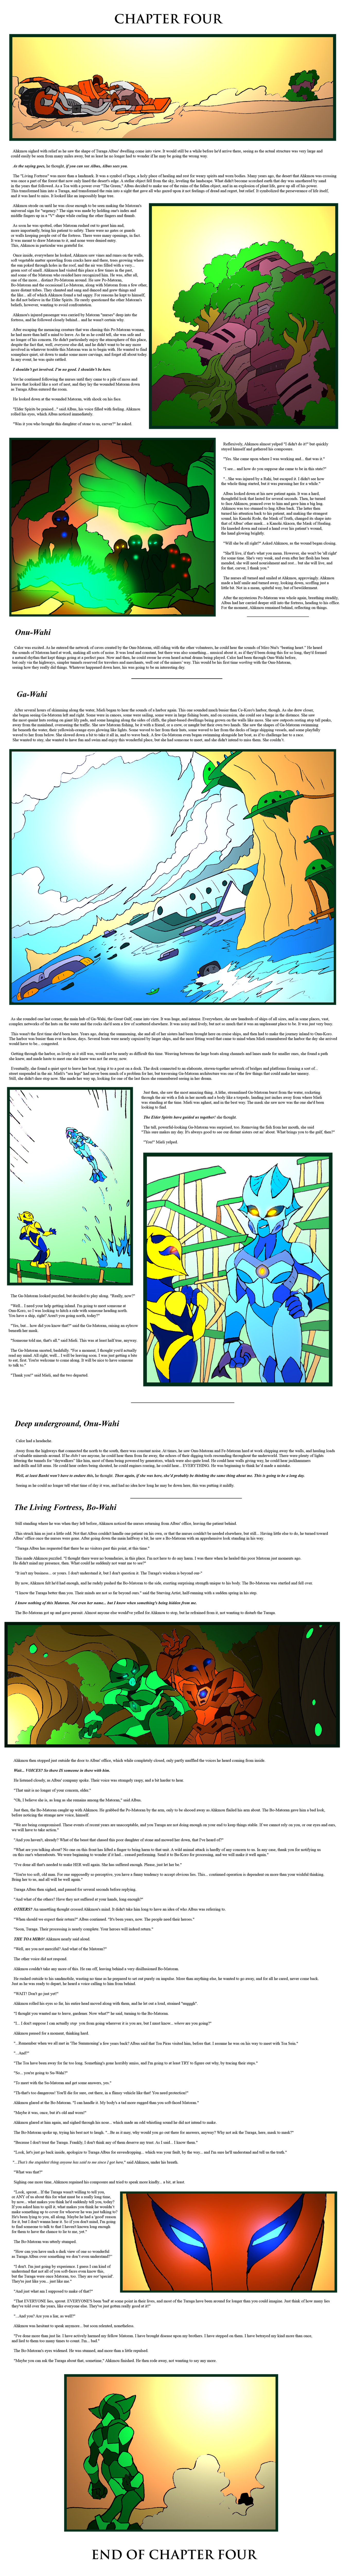 Bionicle- Nova Orbis- Mystery- Chapter 4 by NickinAmerica